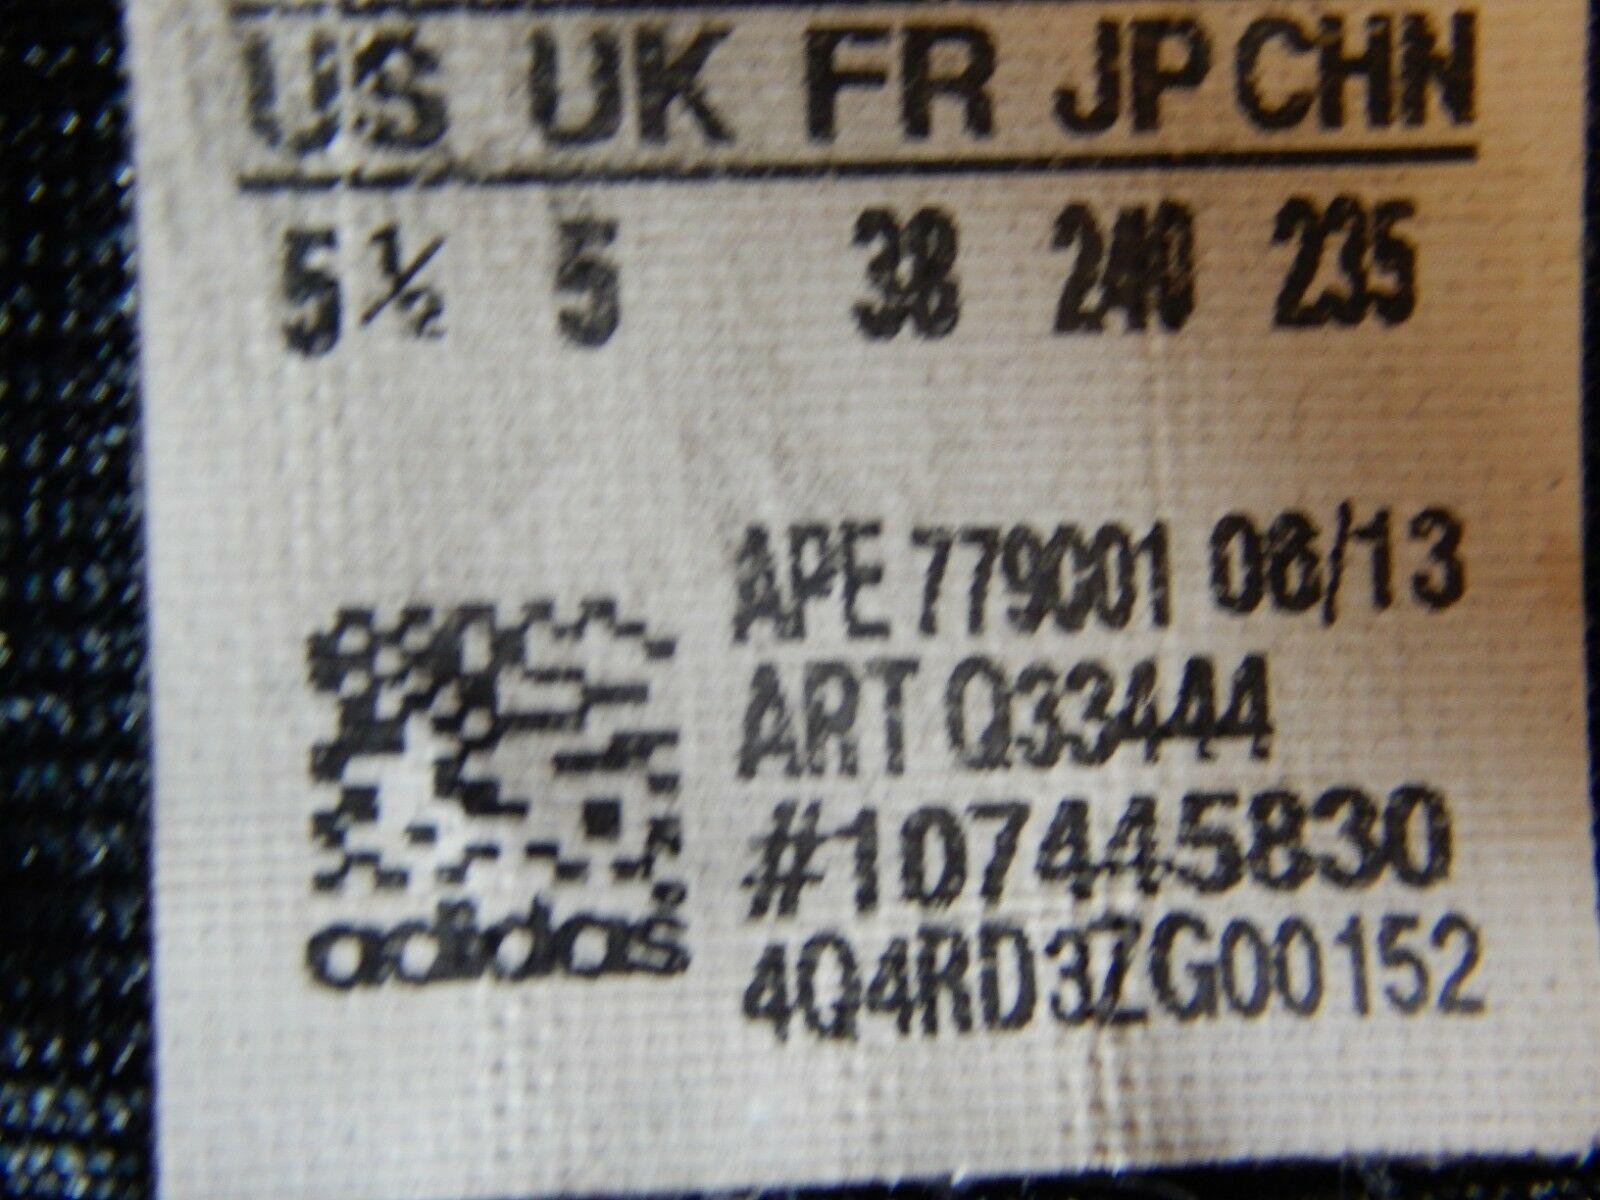 Adidas Crazy Shadow 2 5.5 M (Y) EU 38 Youth Kid's Basketball Shoes Blue Q33444